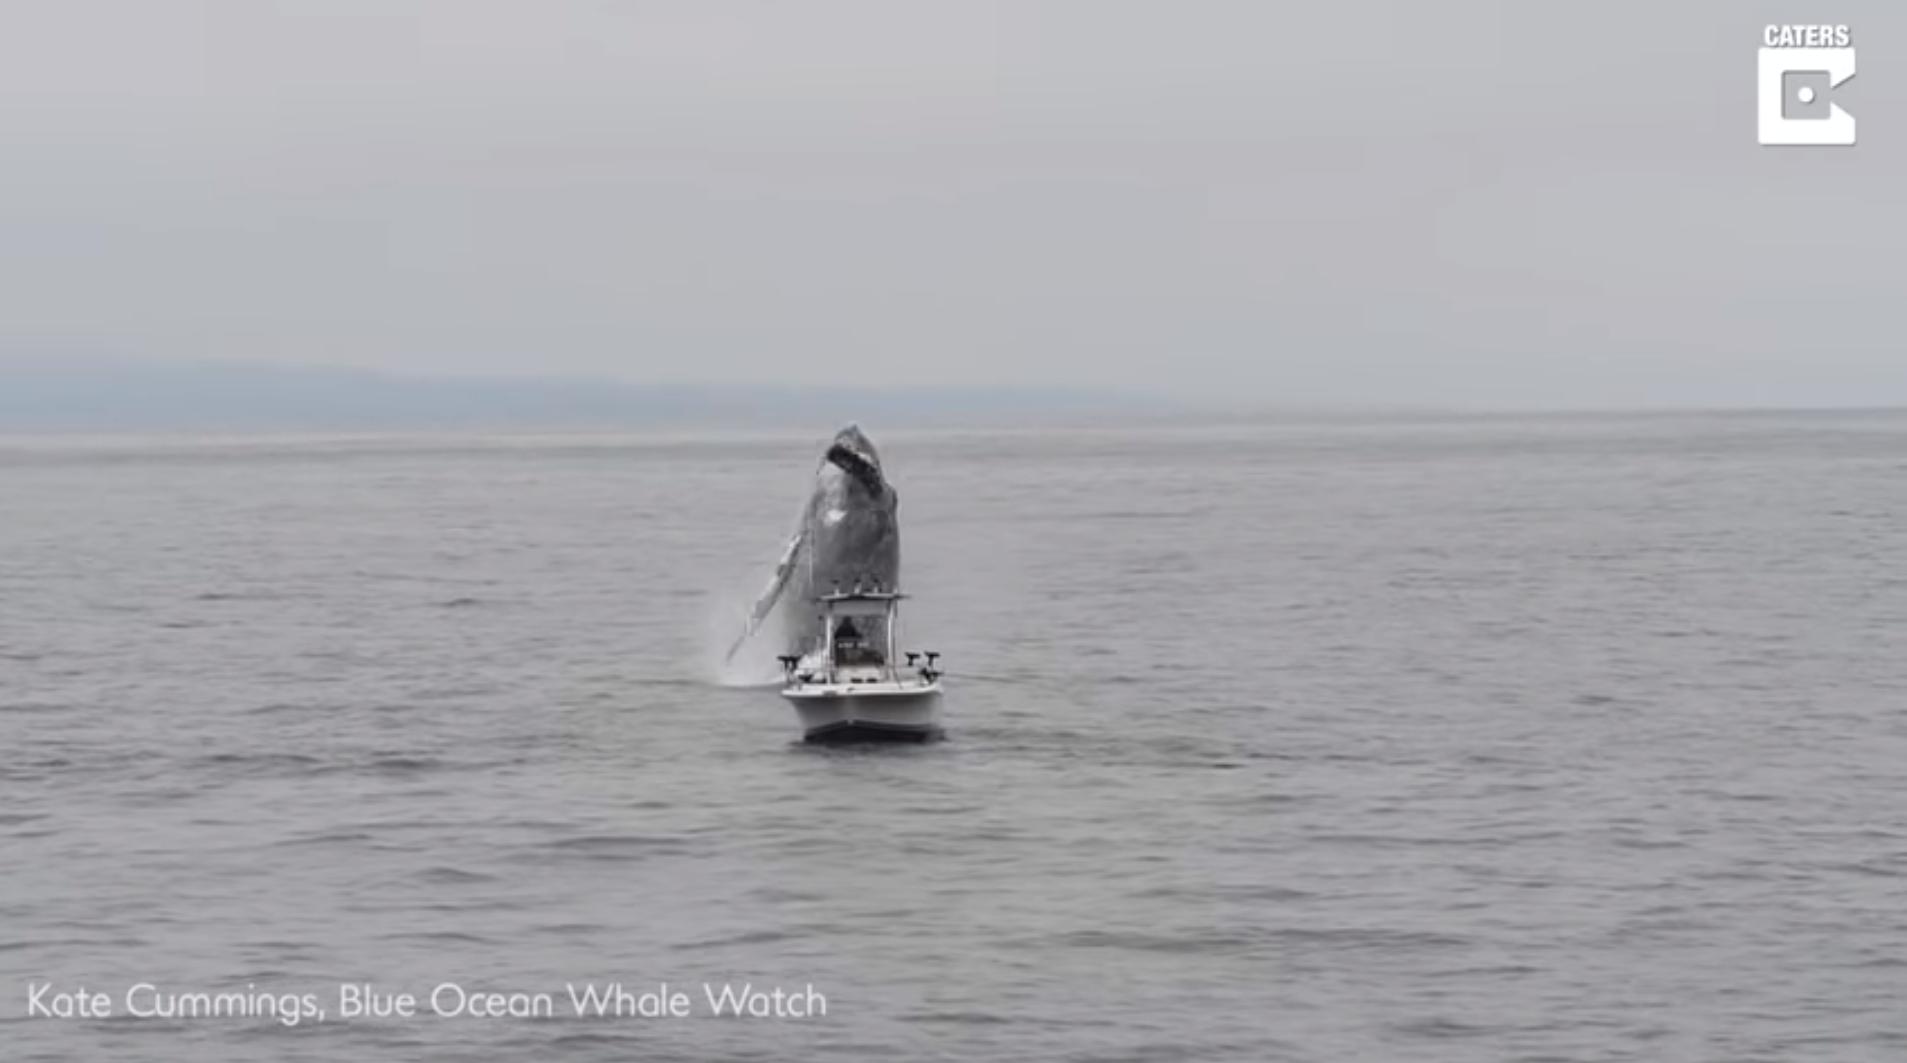 Kit iznenadio ribara: Izronio je kraj brodice i umalo je potopio